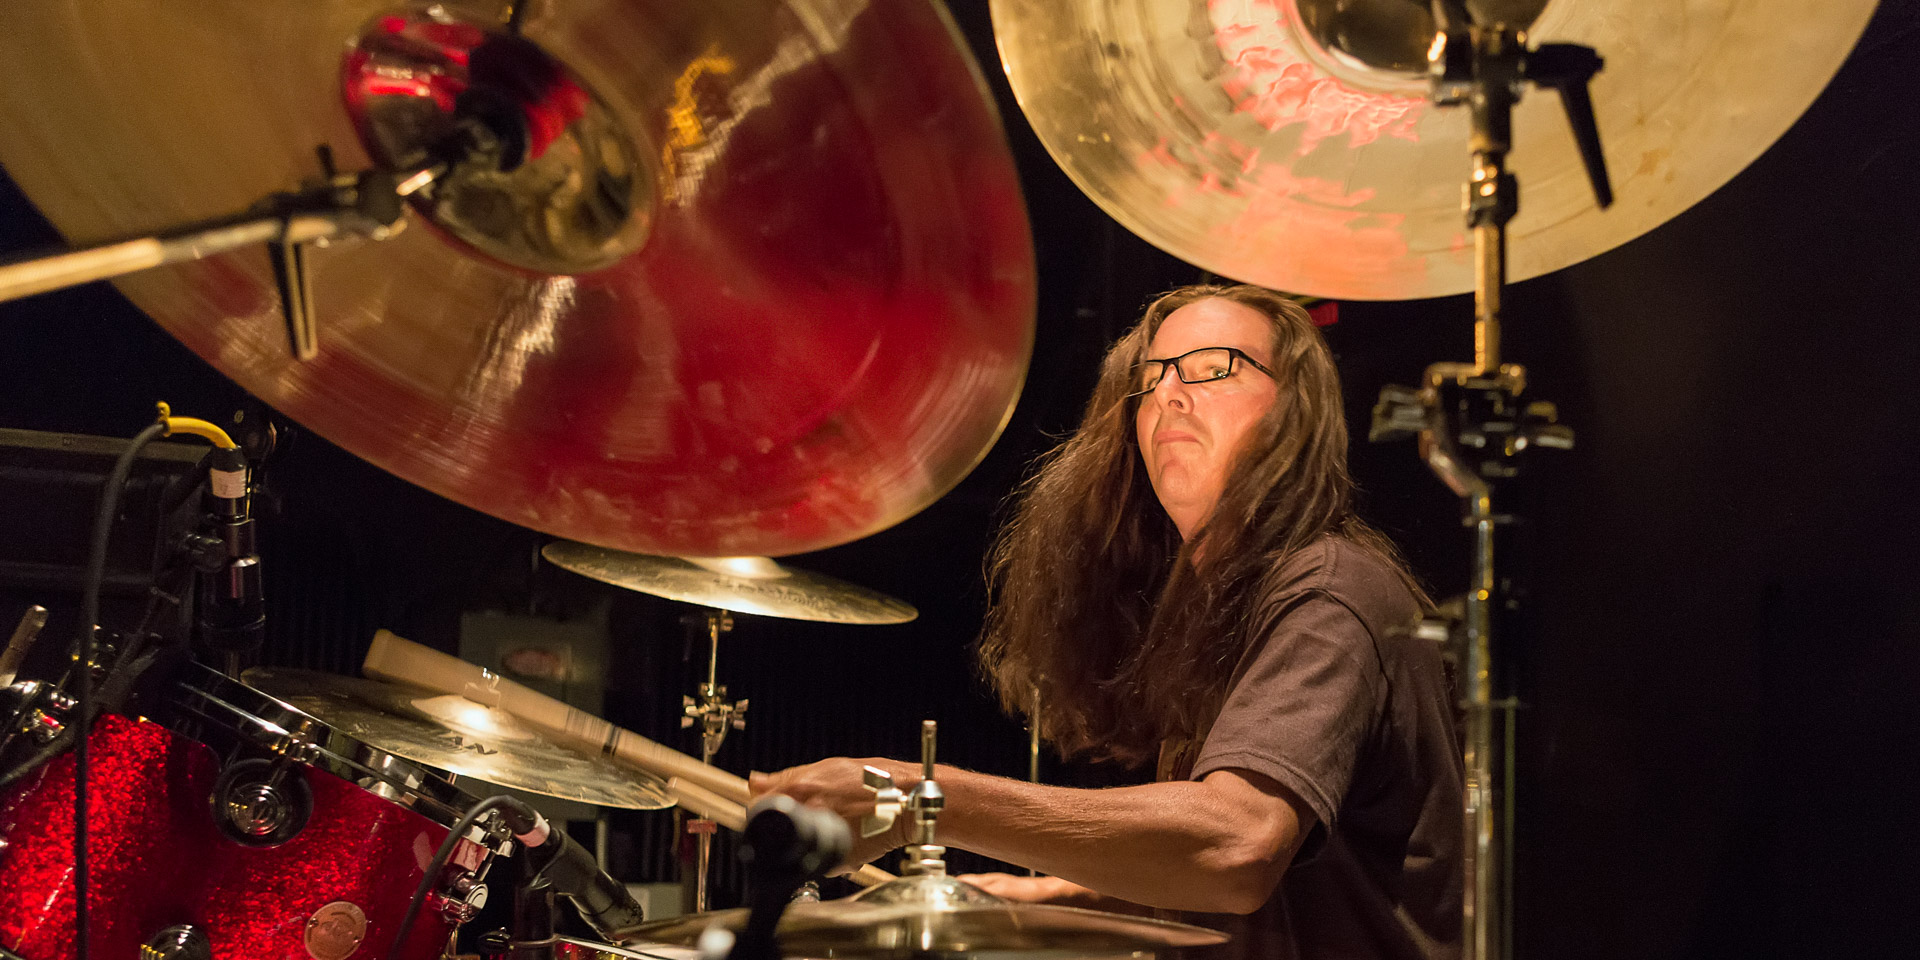 Drummer Jason Patterson during sound check.